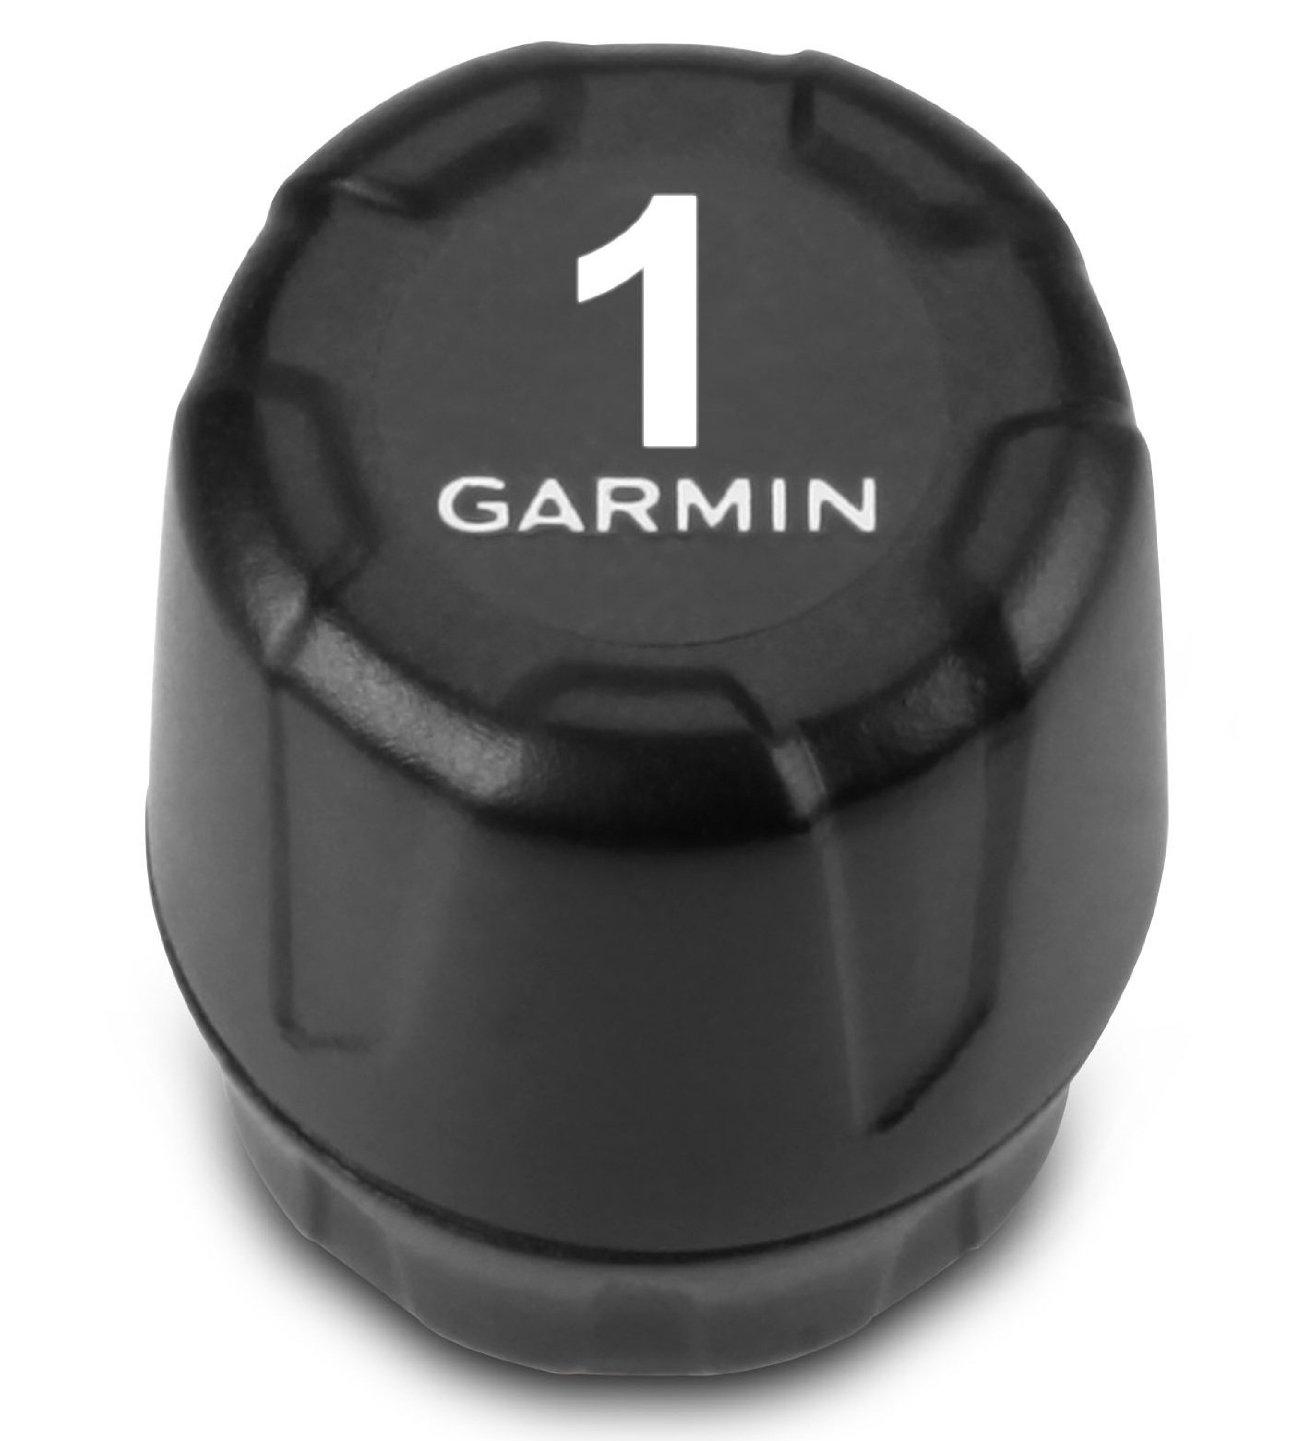 Garmin Tyre Pressure Sensor ANT+ Adapter for Zumo 390LM 590LM 010-11997-00 NEW